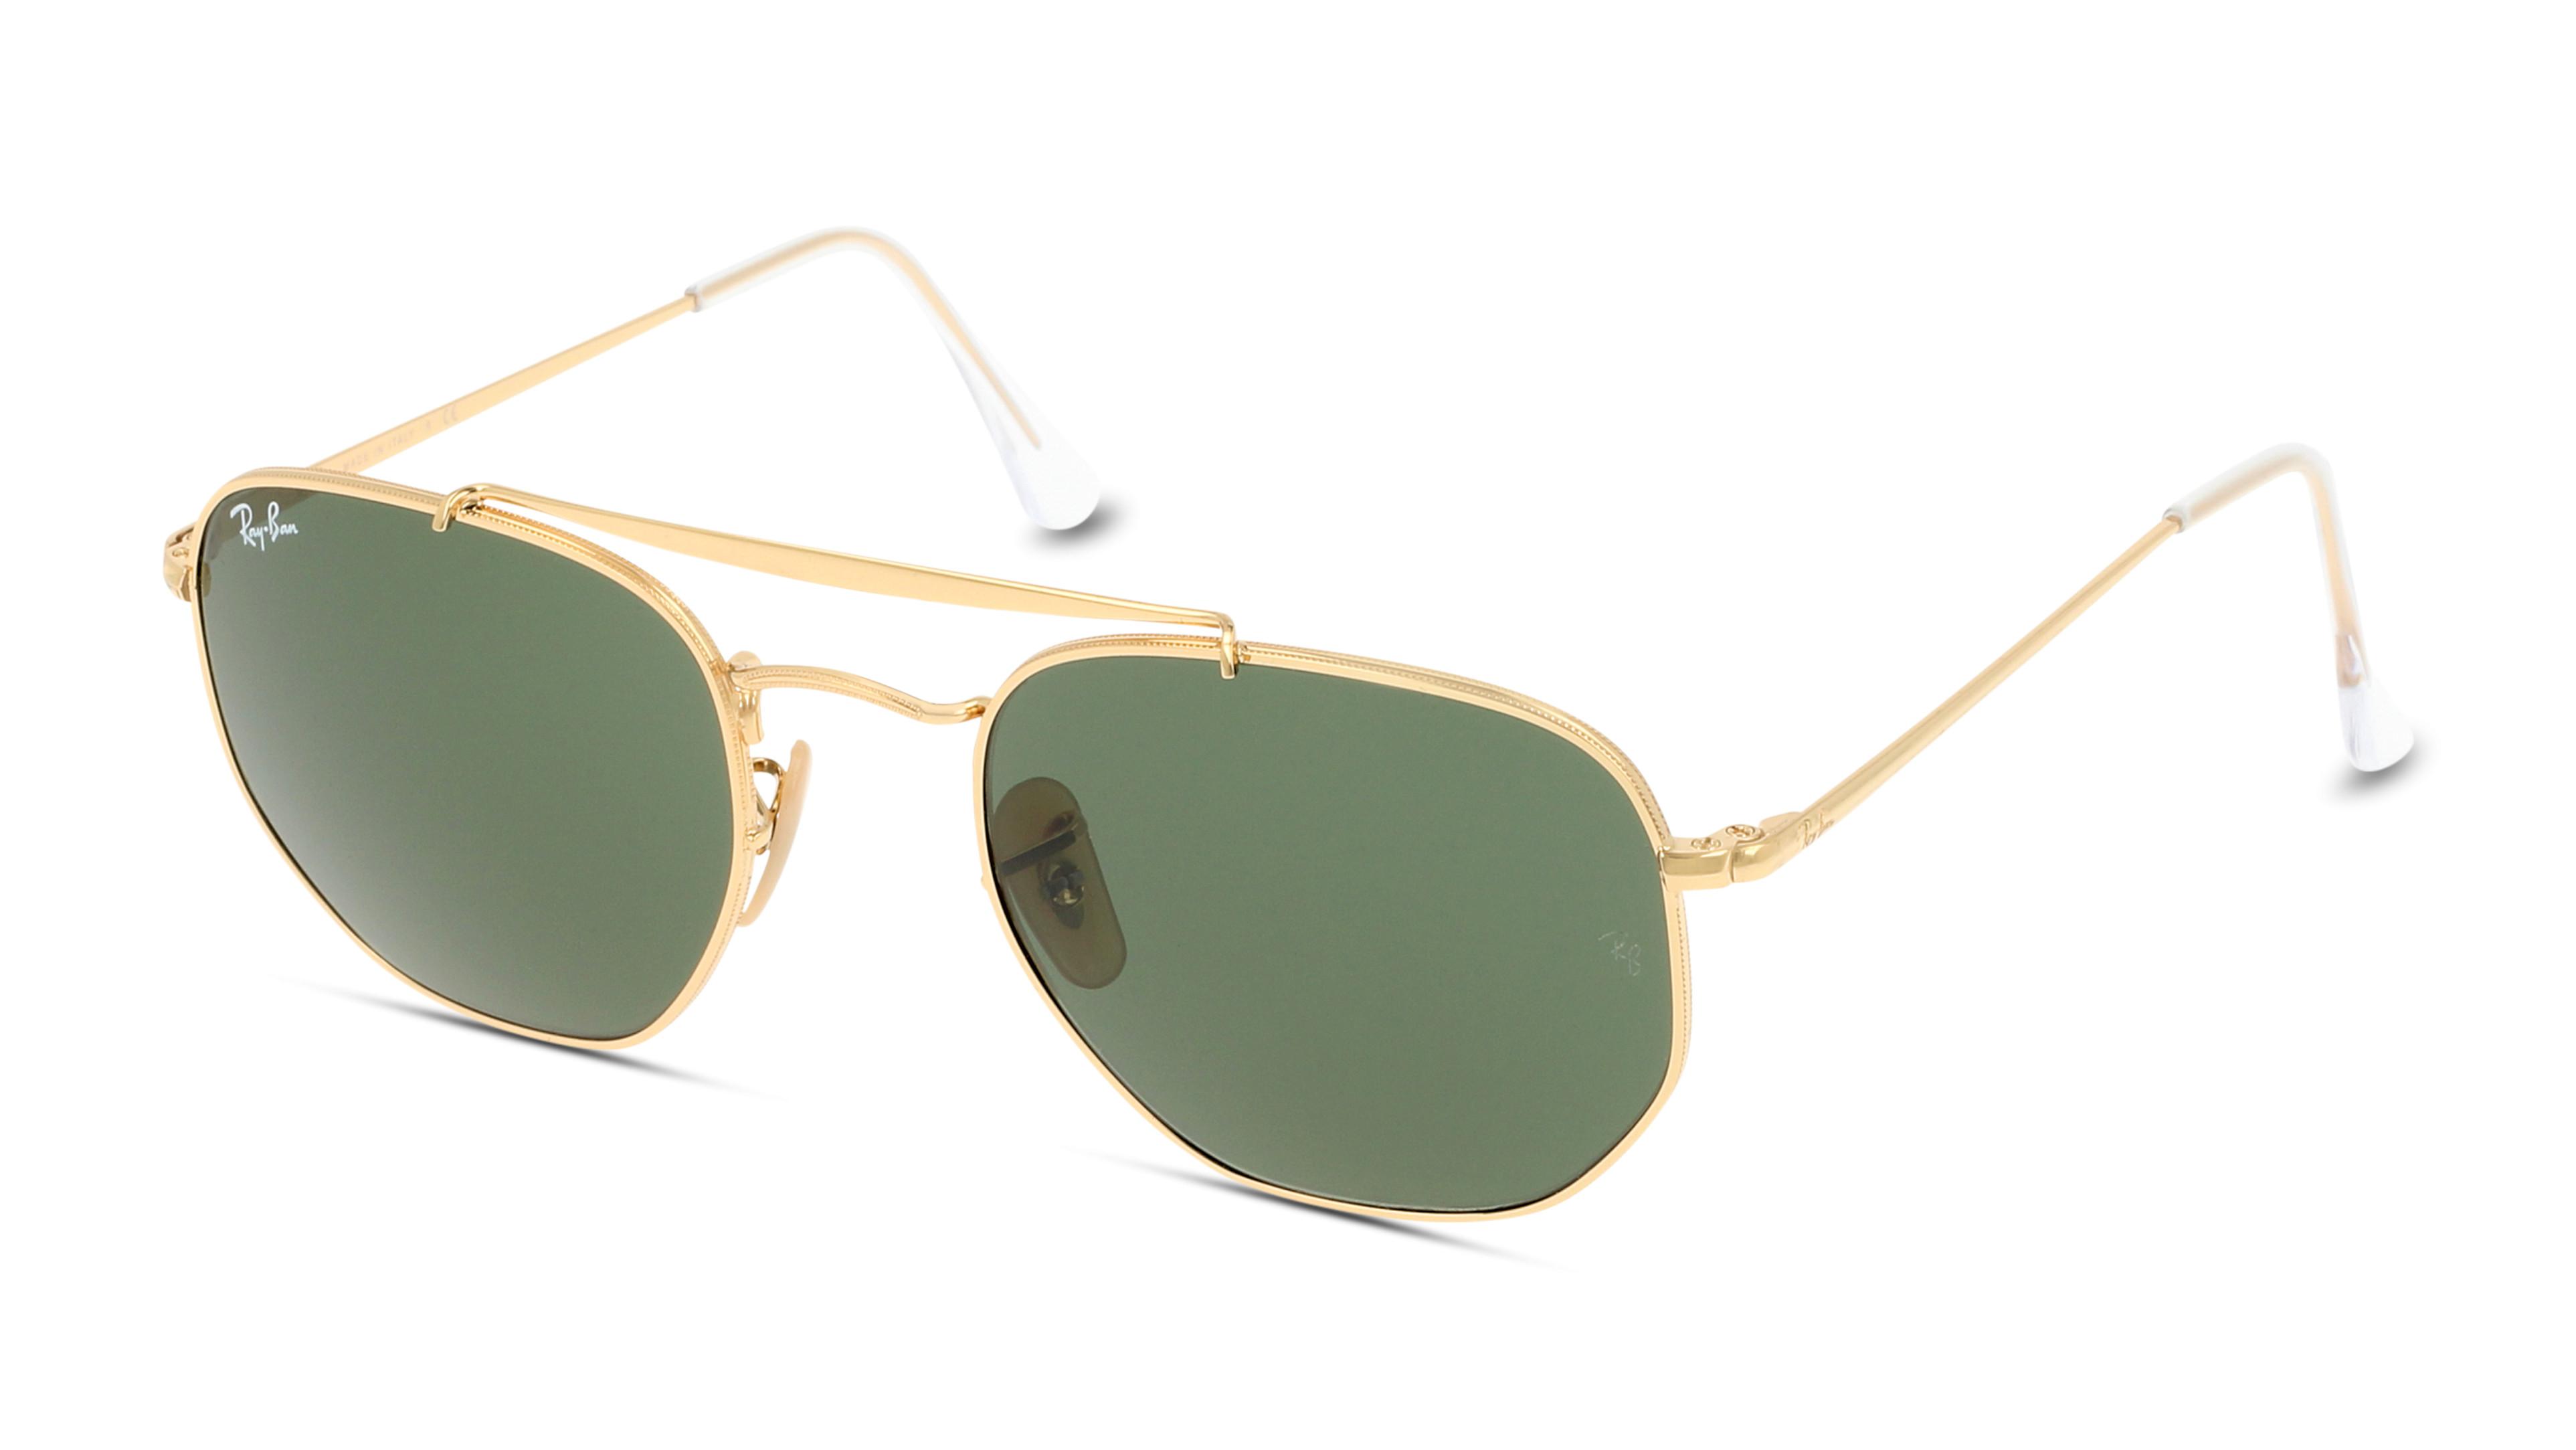 8053672828047-angle-01-rayban-glasses-eyewear-pair